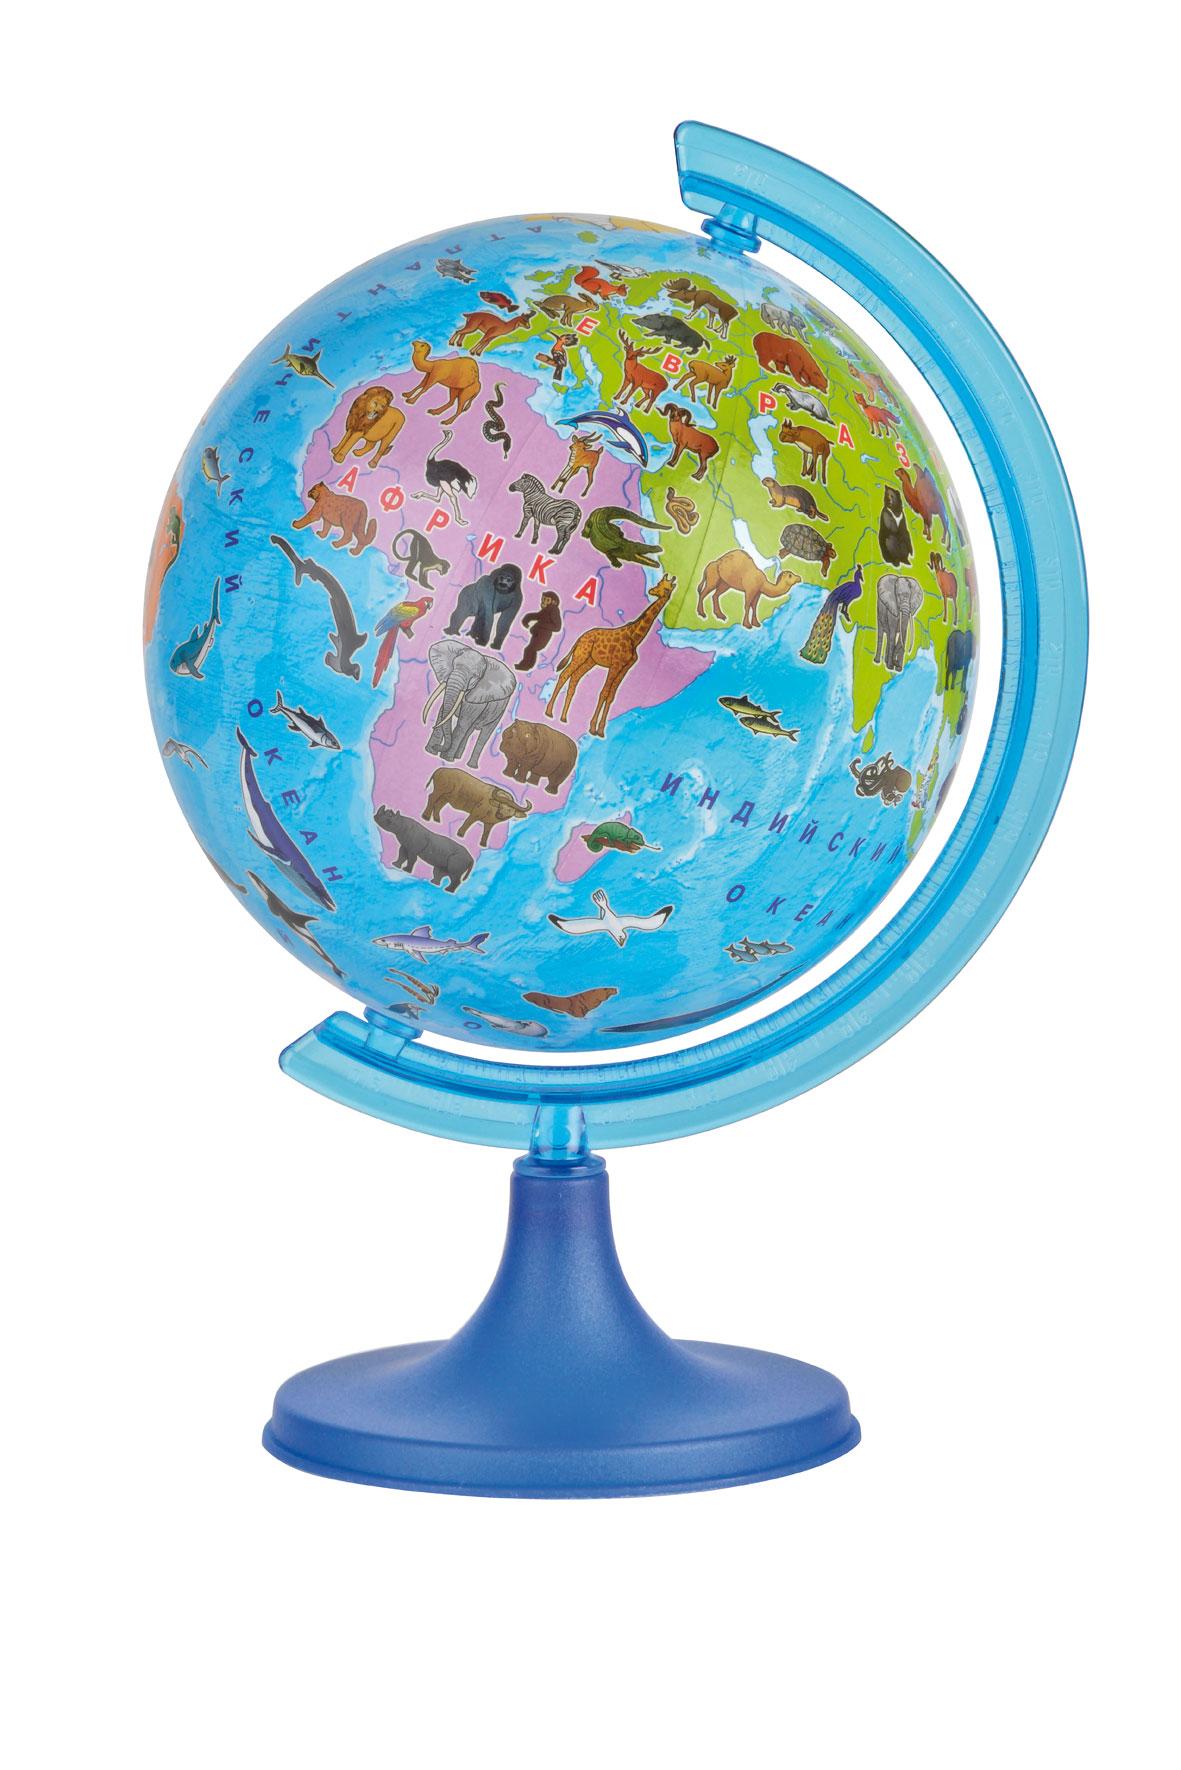 Глобус DMB Сафари, диаметр 16 см + Мини-энциклопедия Животный Мир Земли издательство ди эм би глобус сафари 16 см и мини энциклопедия